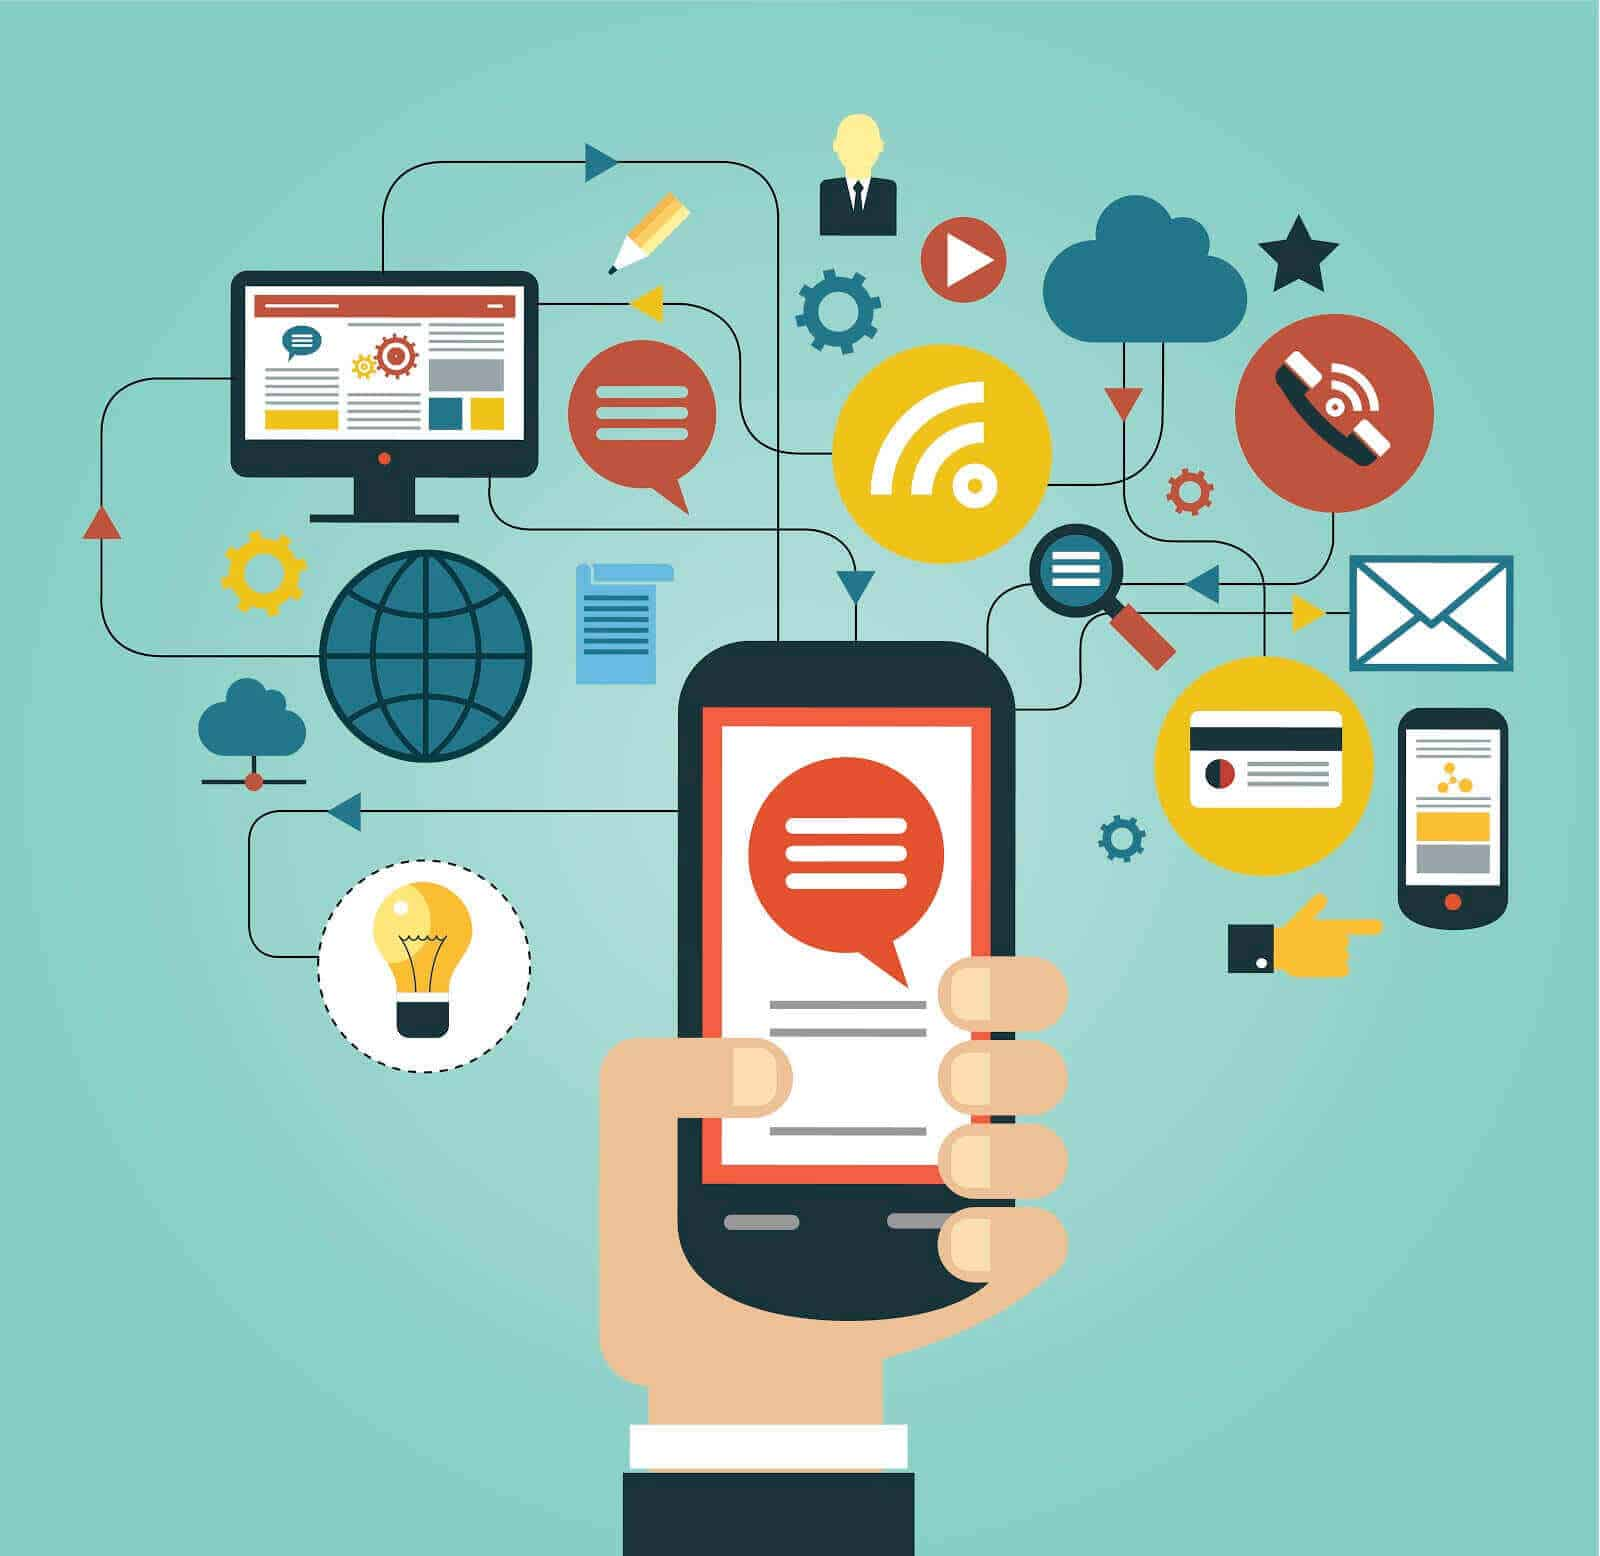 mobile crm app